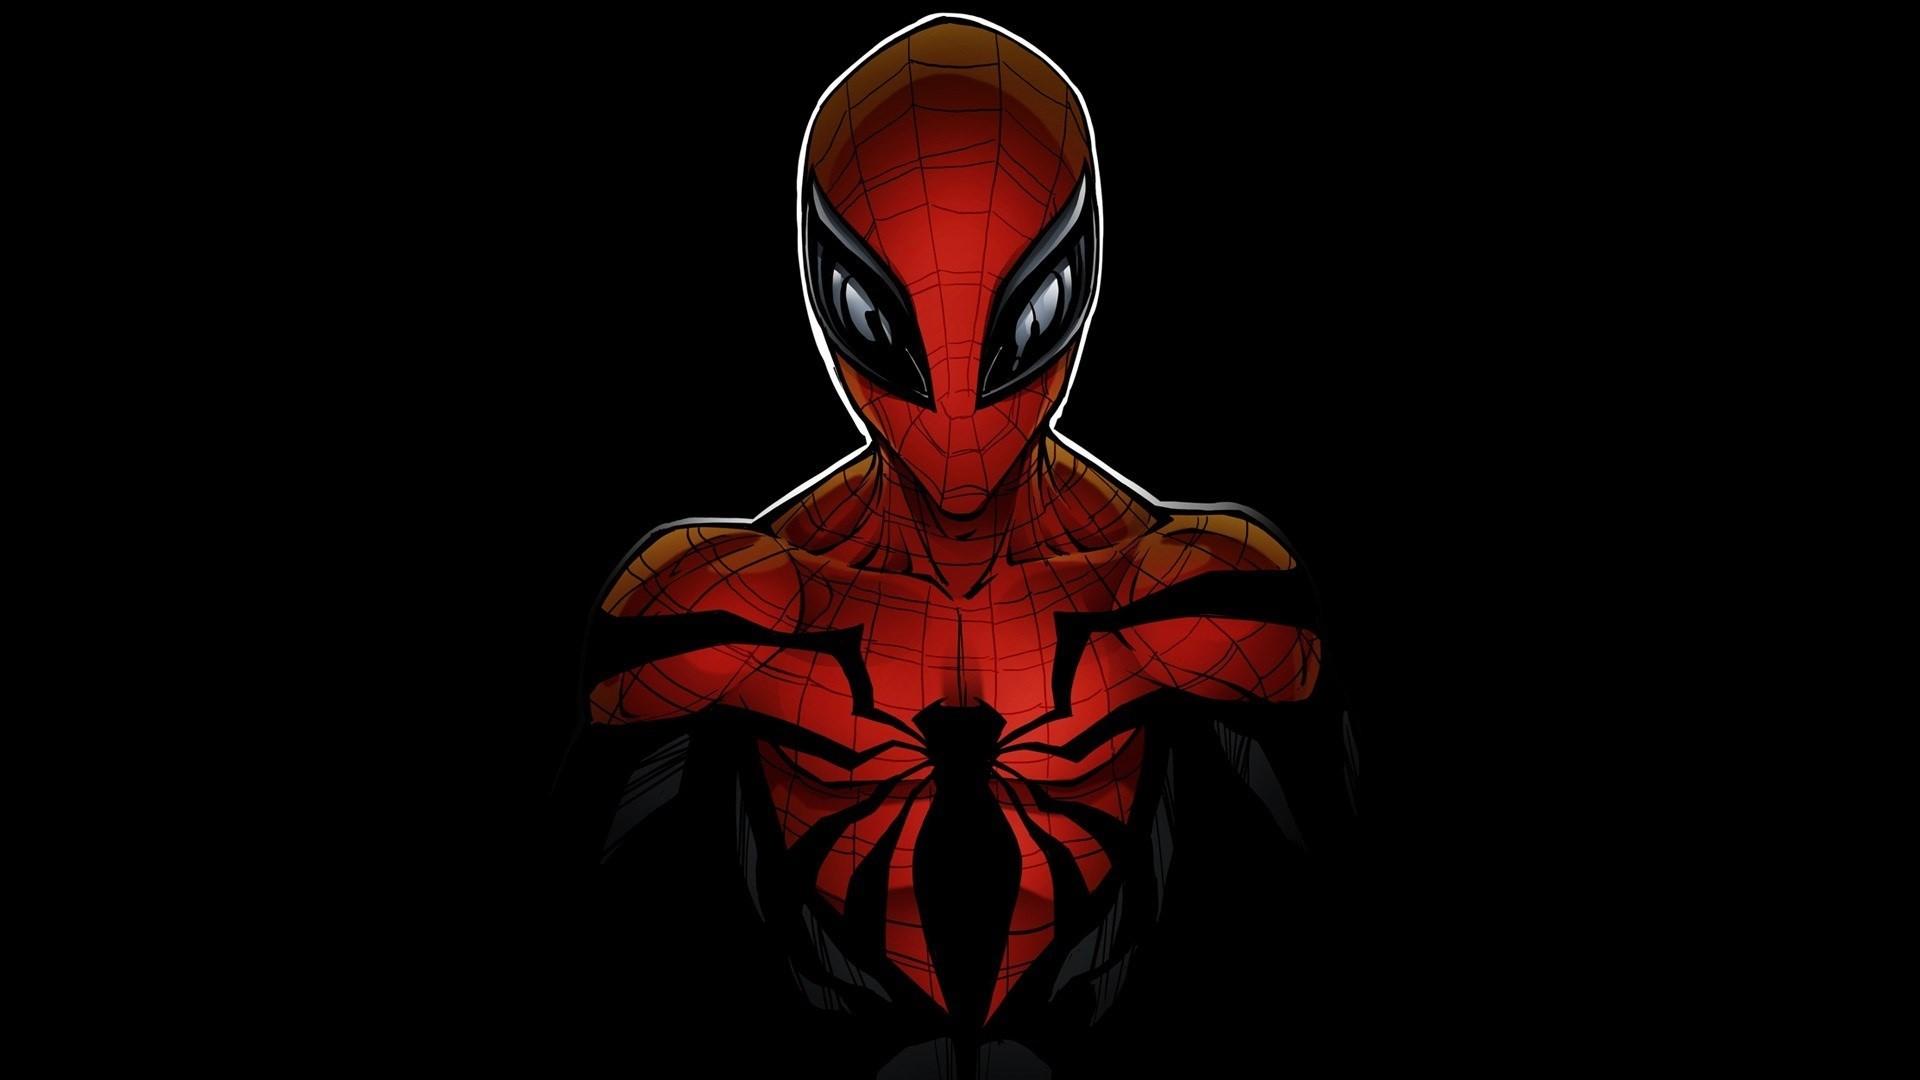 1920x1080 Spiderman Wallappers For Desktop 6